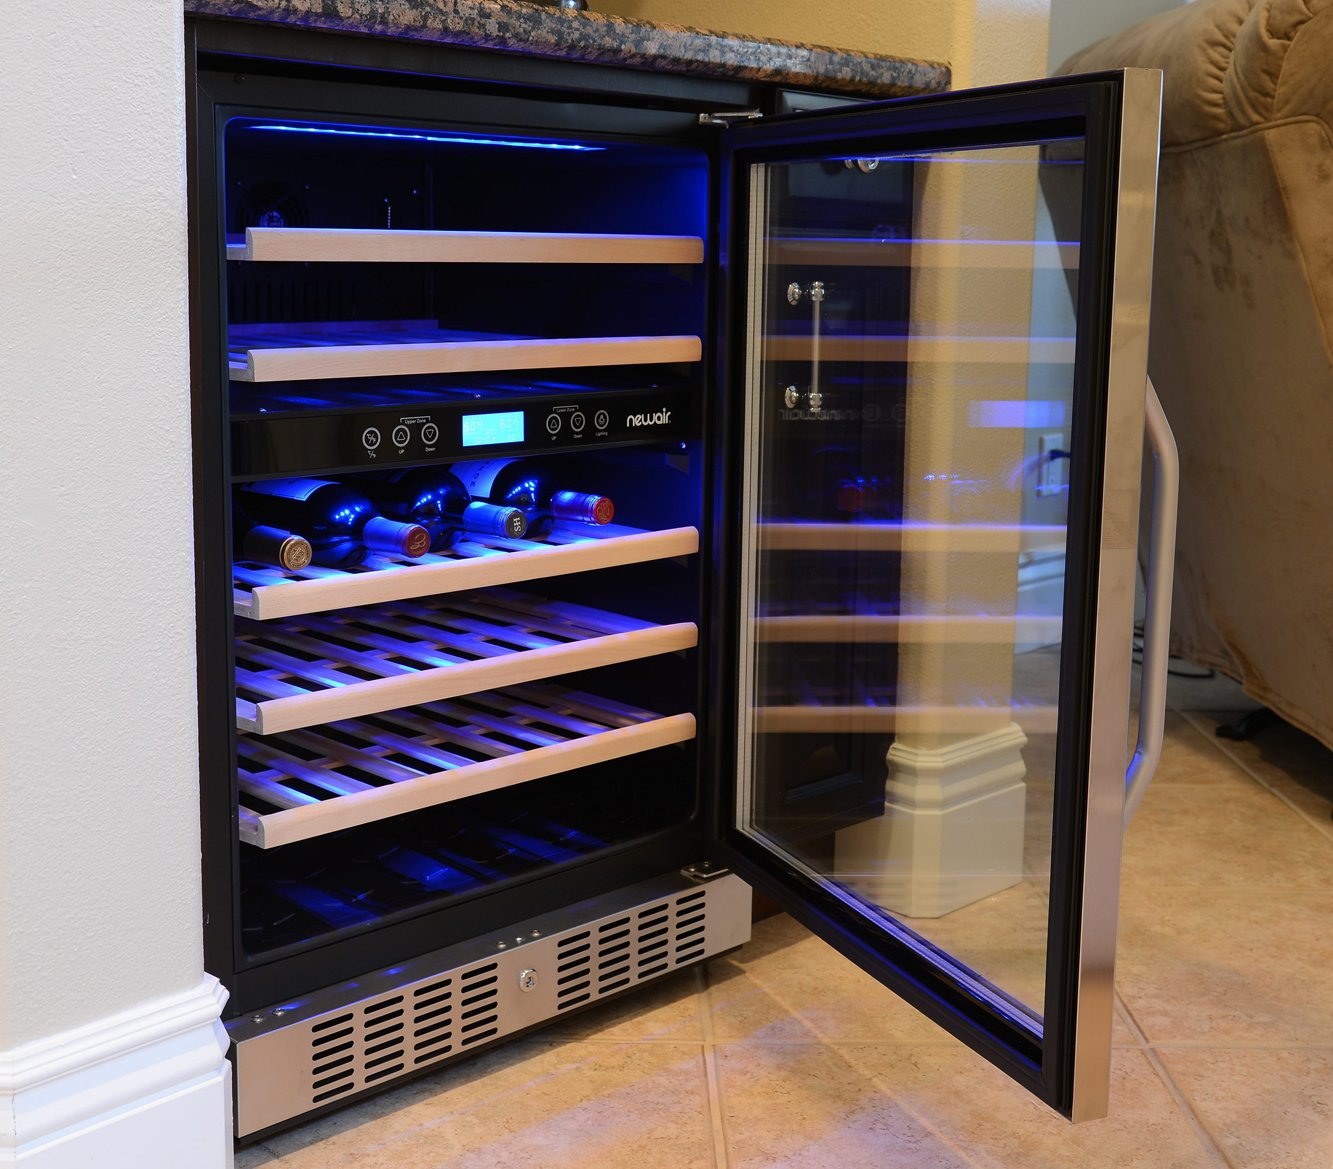 amazoncom newair awr460db 46 bottle built in dual zone compressor wine cooler stainless steel u0026 black kitchen u0026 dining - Dual Zone Wine Cooler